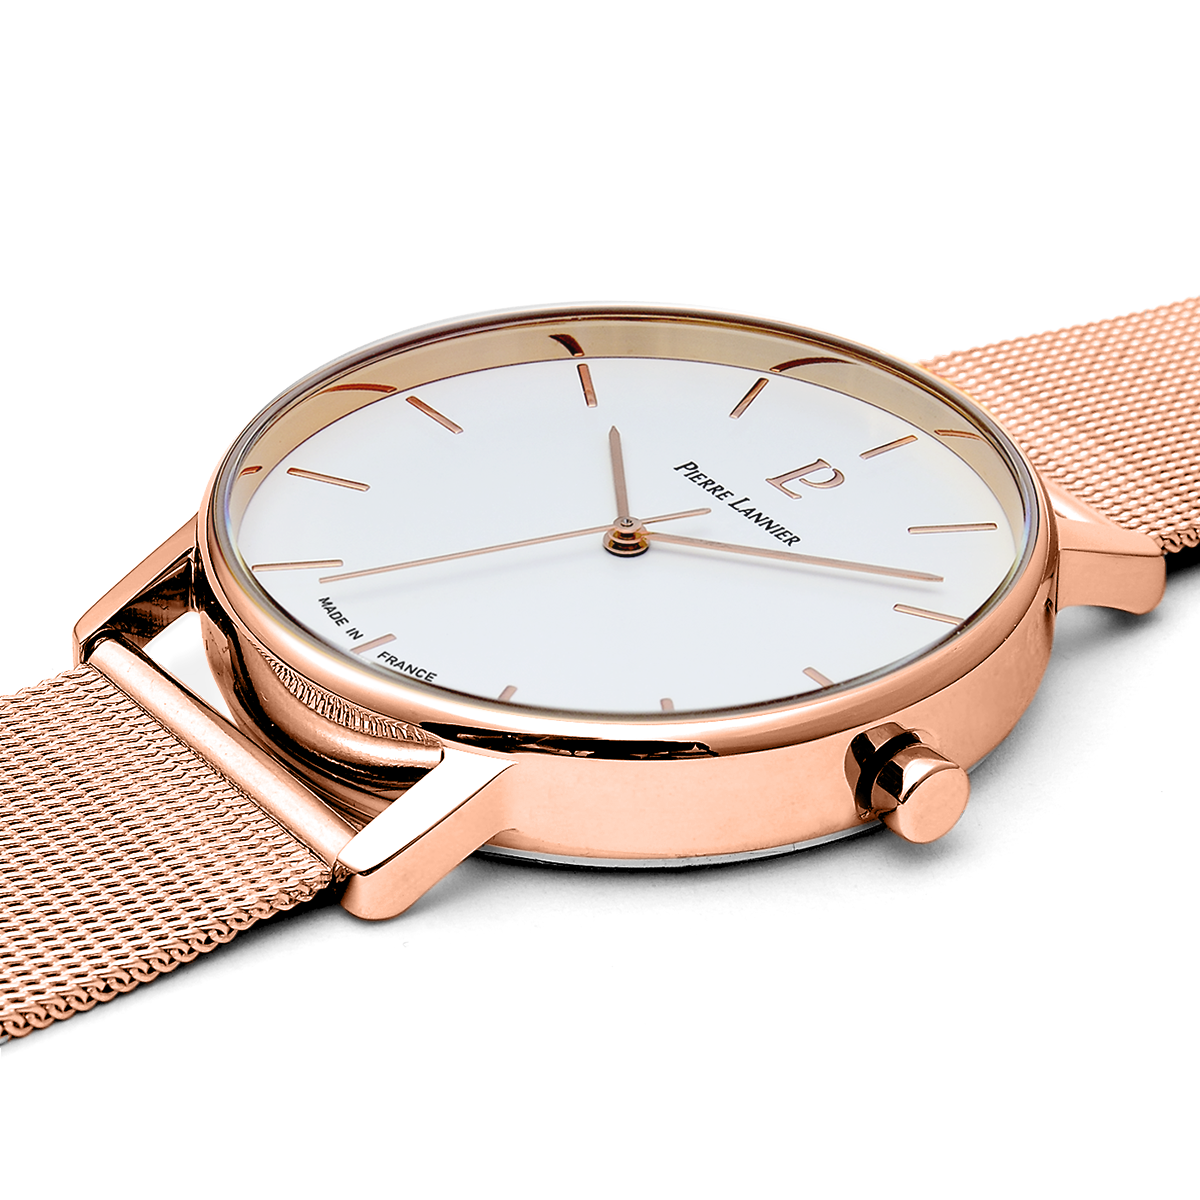 Женские часы Pierre Lannier Catalane Box 389B928